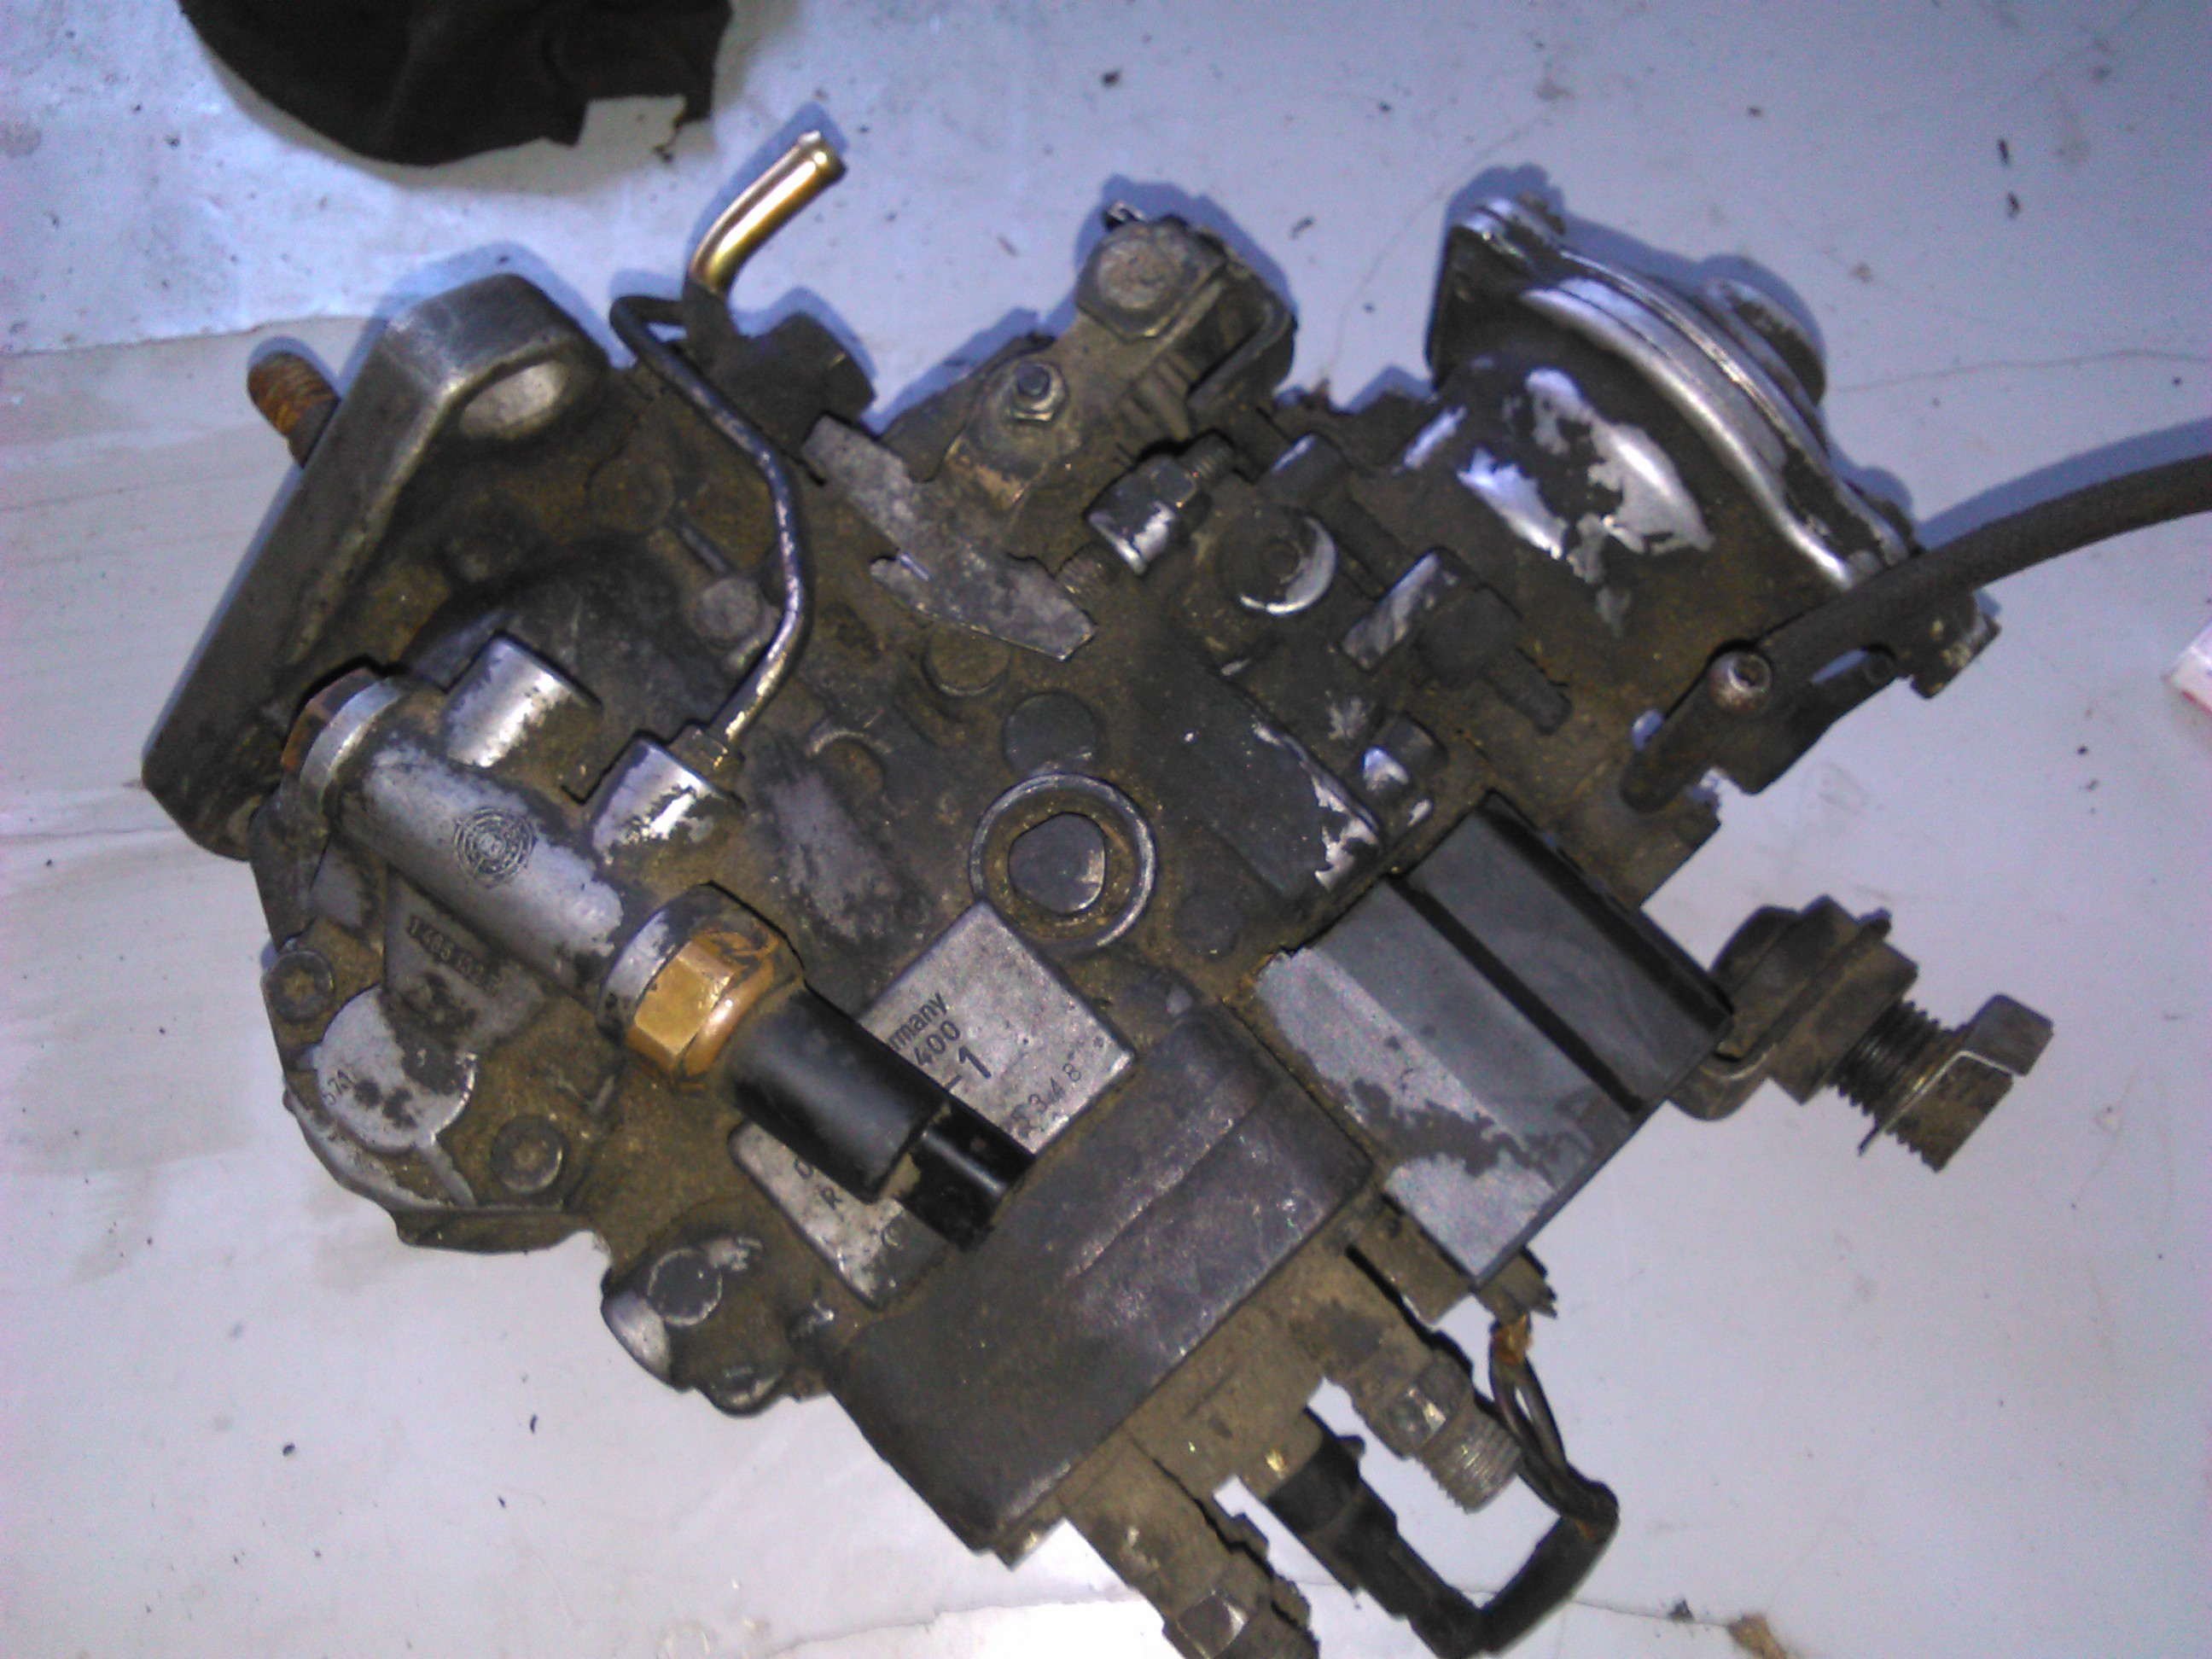 Pompa de injectie Fiat Ducato 1.9td cod 0460494400